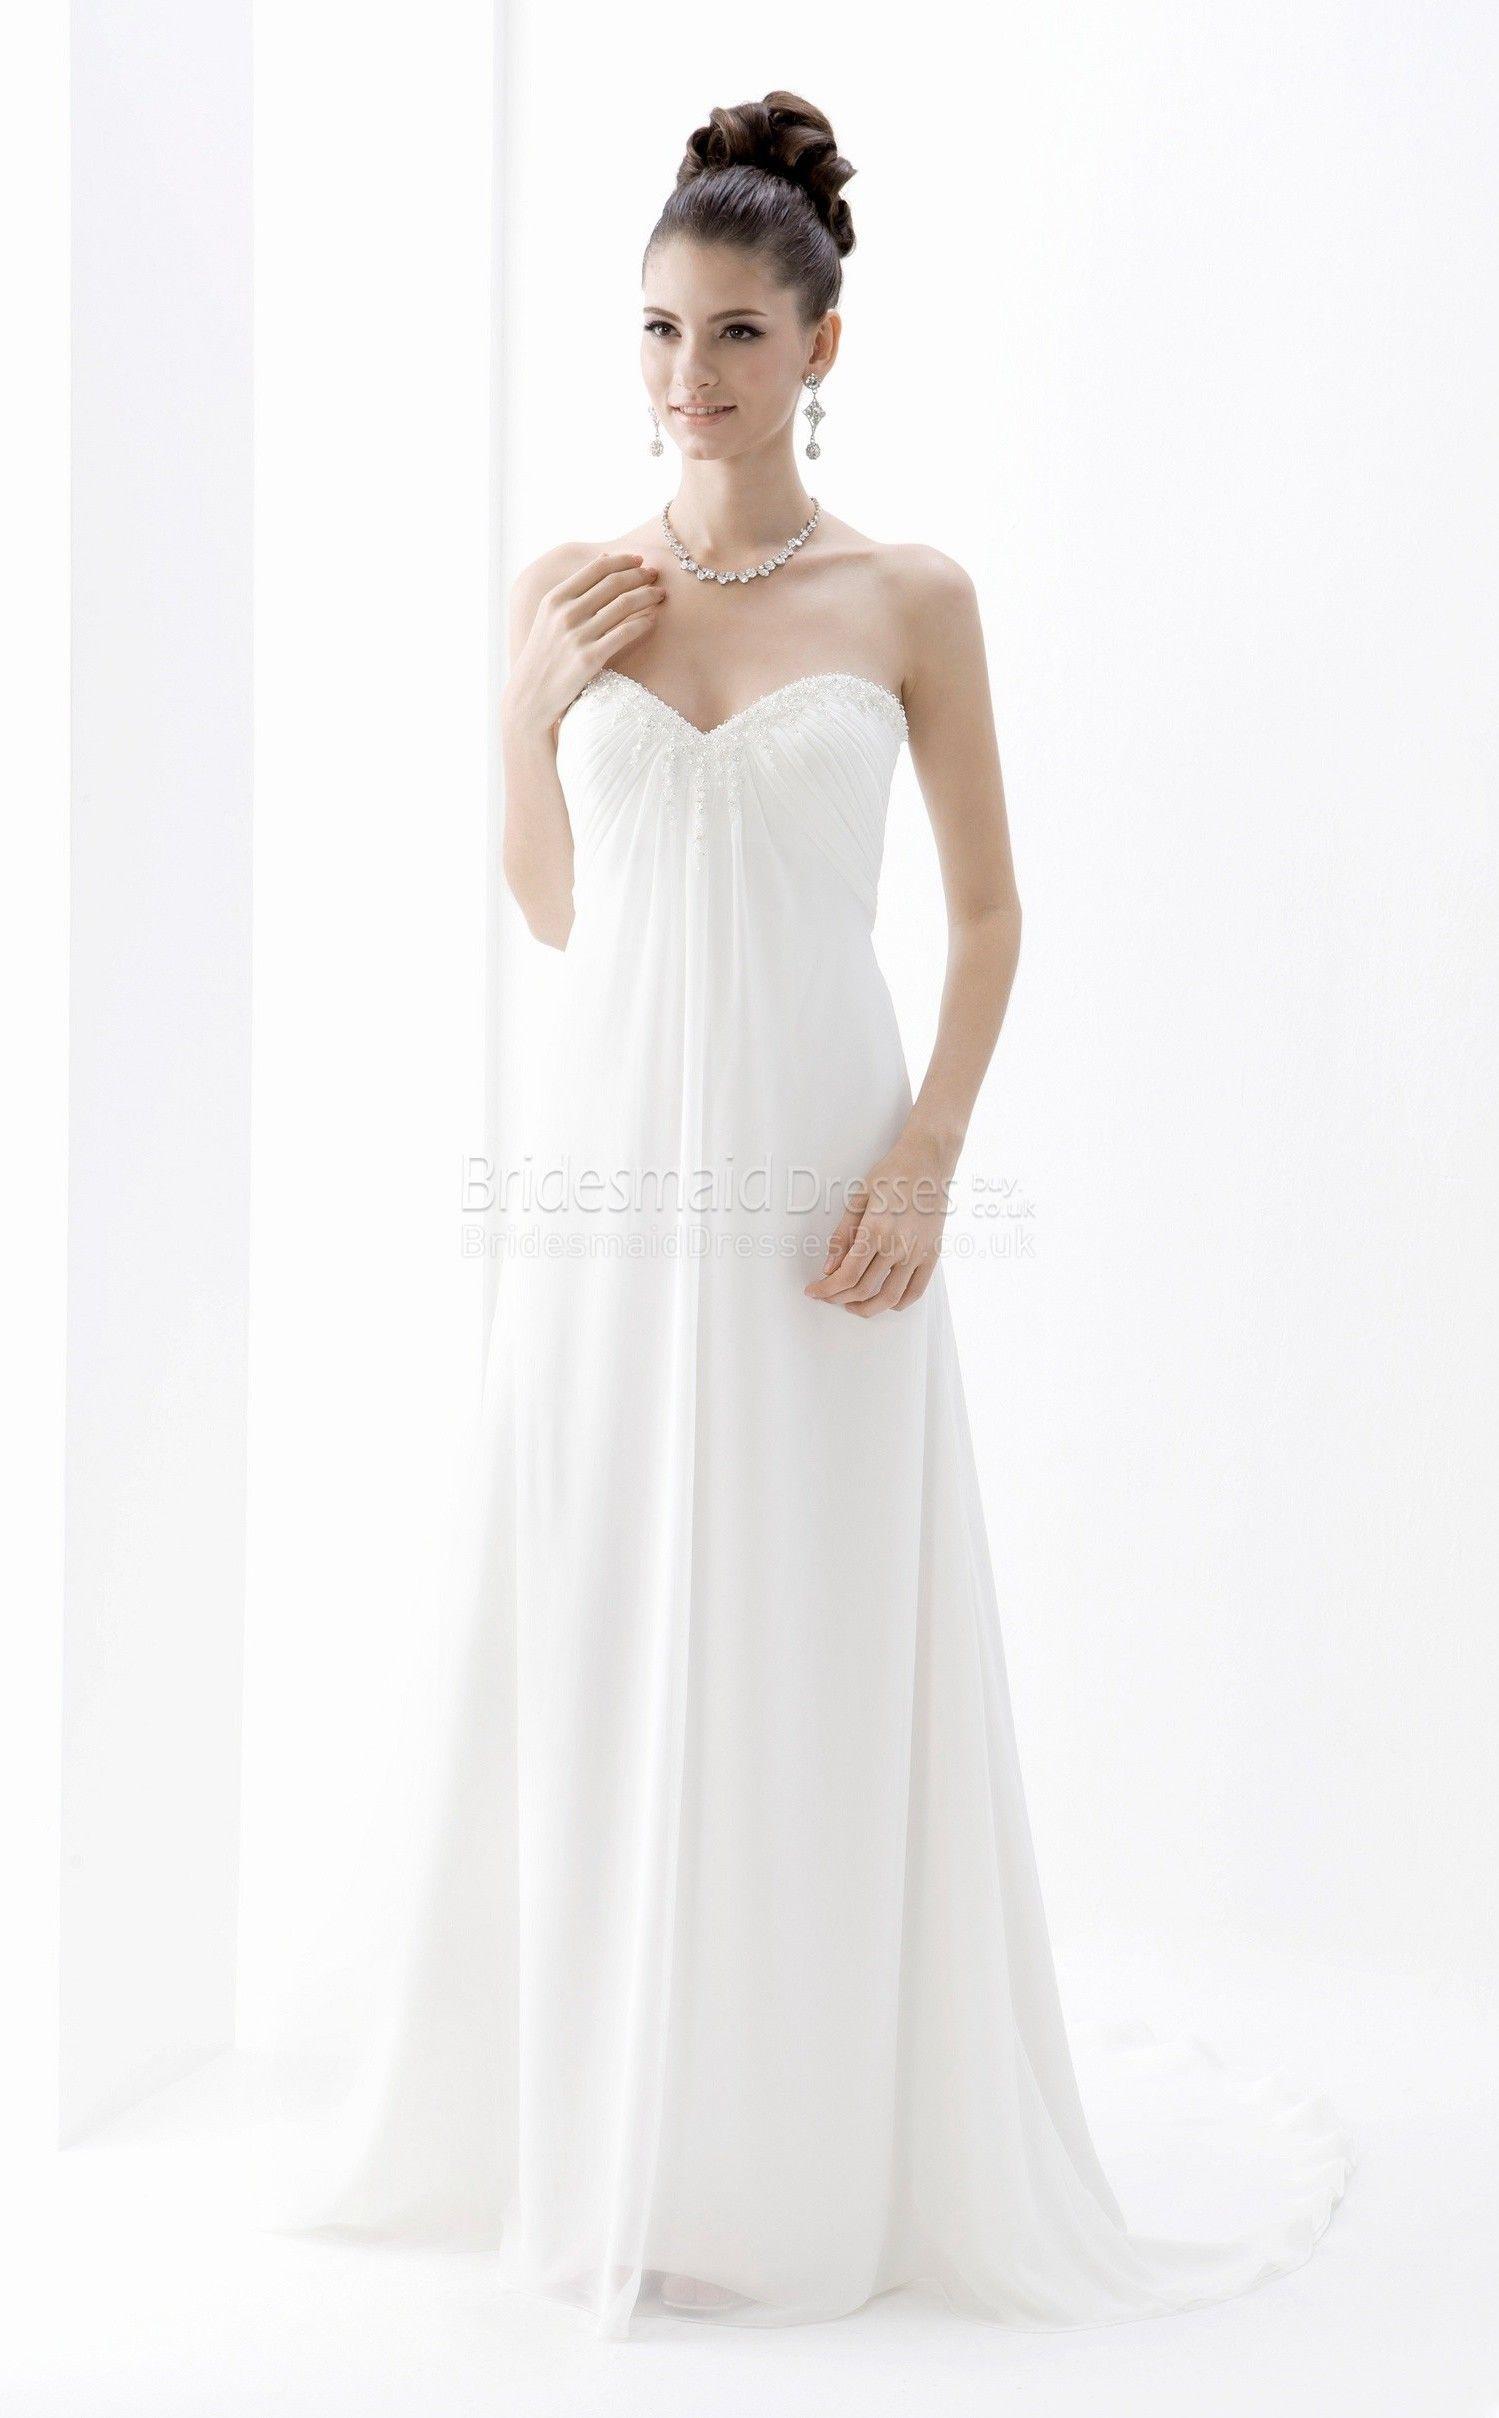 beach wedding dresses,simple wedding dresses | My Style | Pinterest